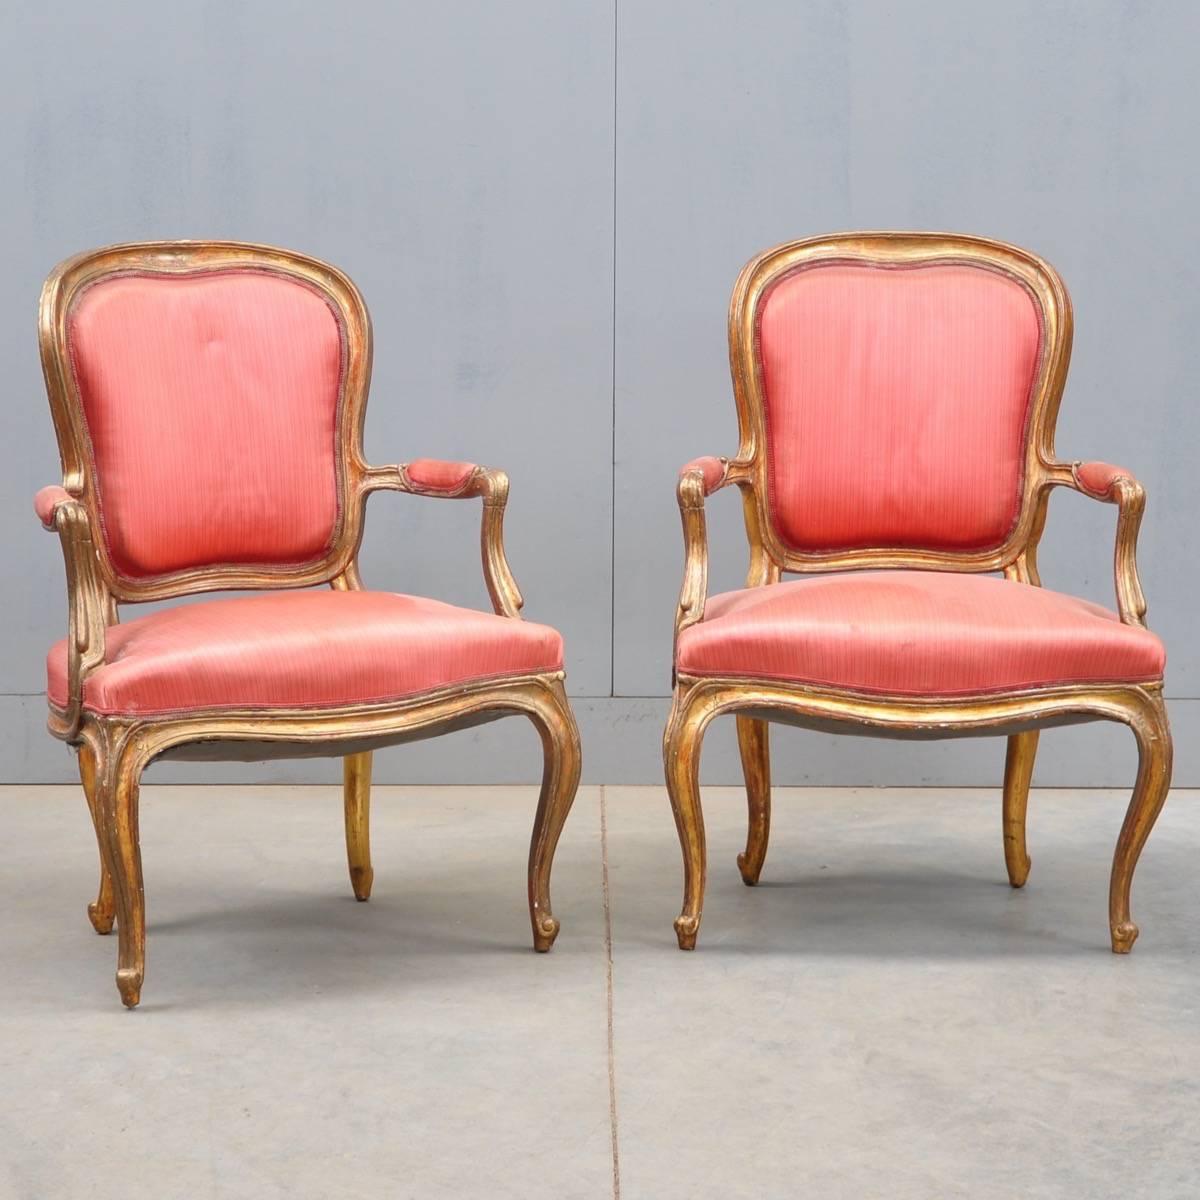 Top Pair of LOUIS XV armchairs | De Grande Antique Furniture AF06